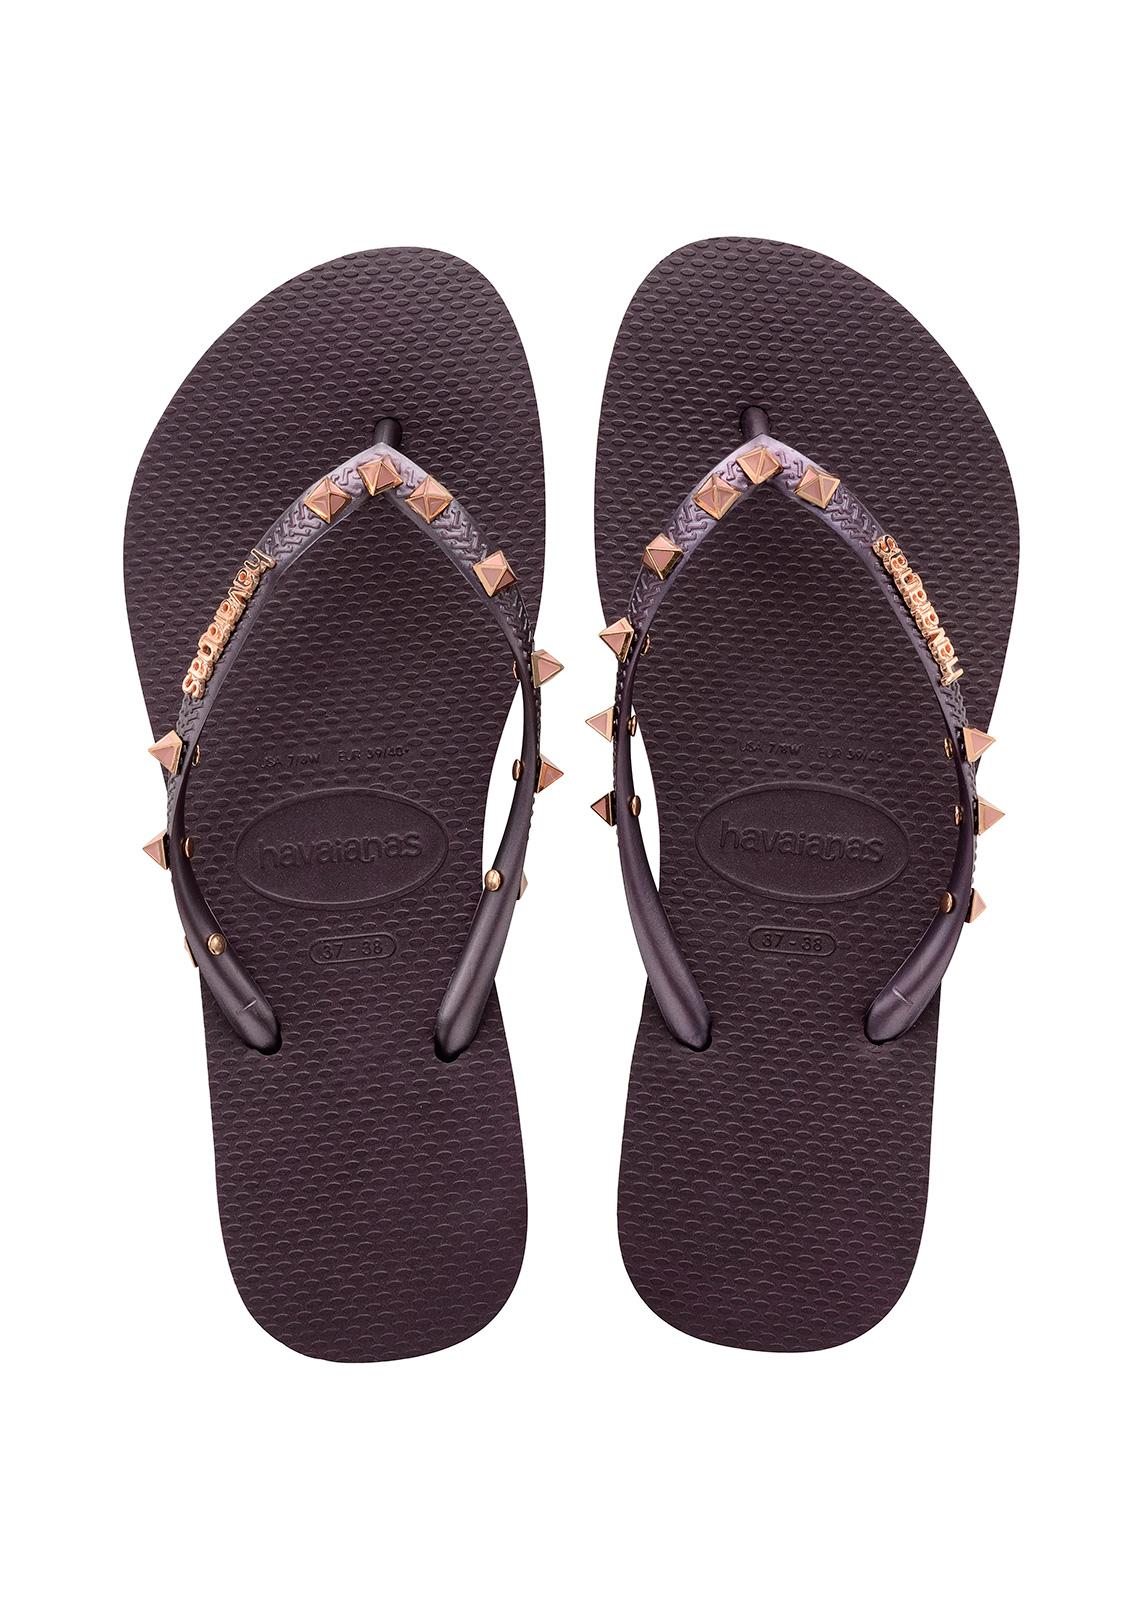 Flip-Flops Flip-Flops - Havaianas Slim Hardware Aubergine -9426